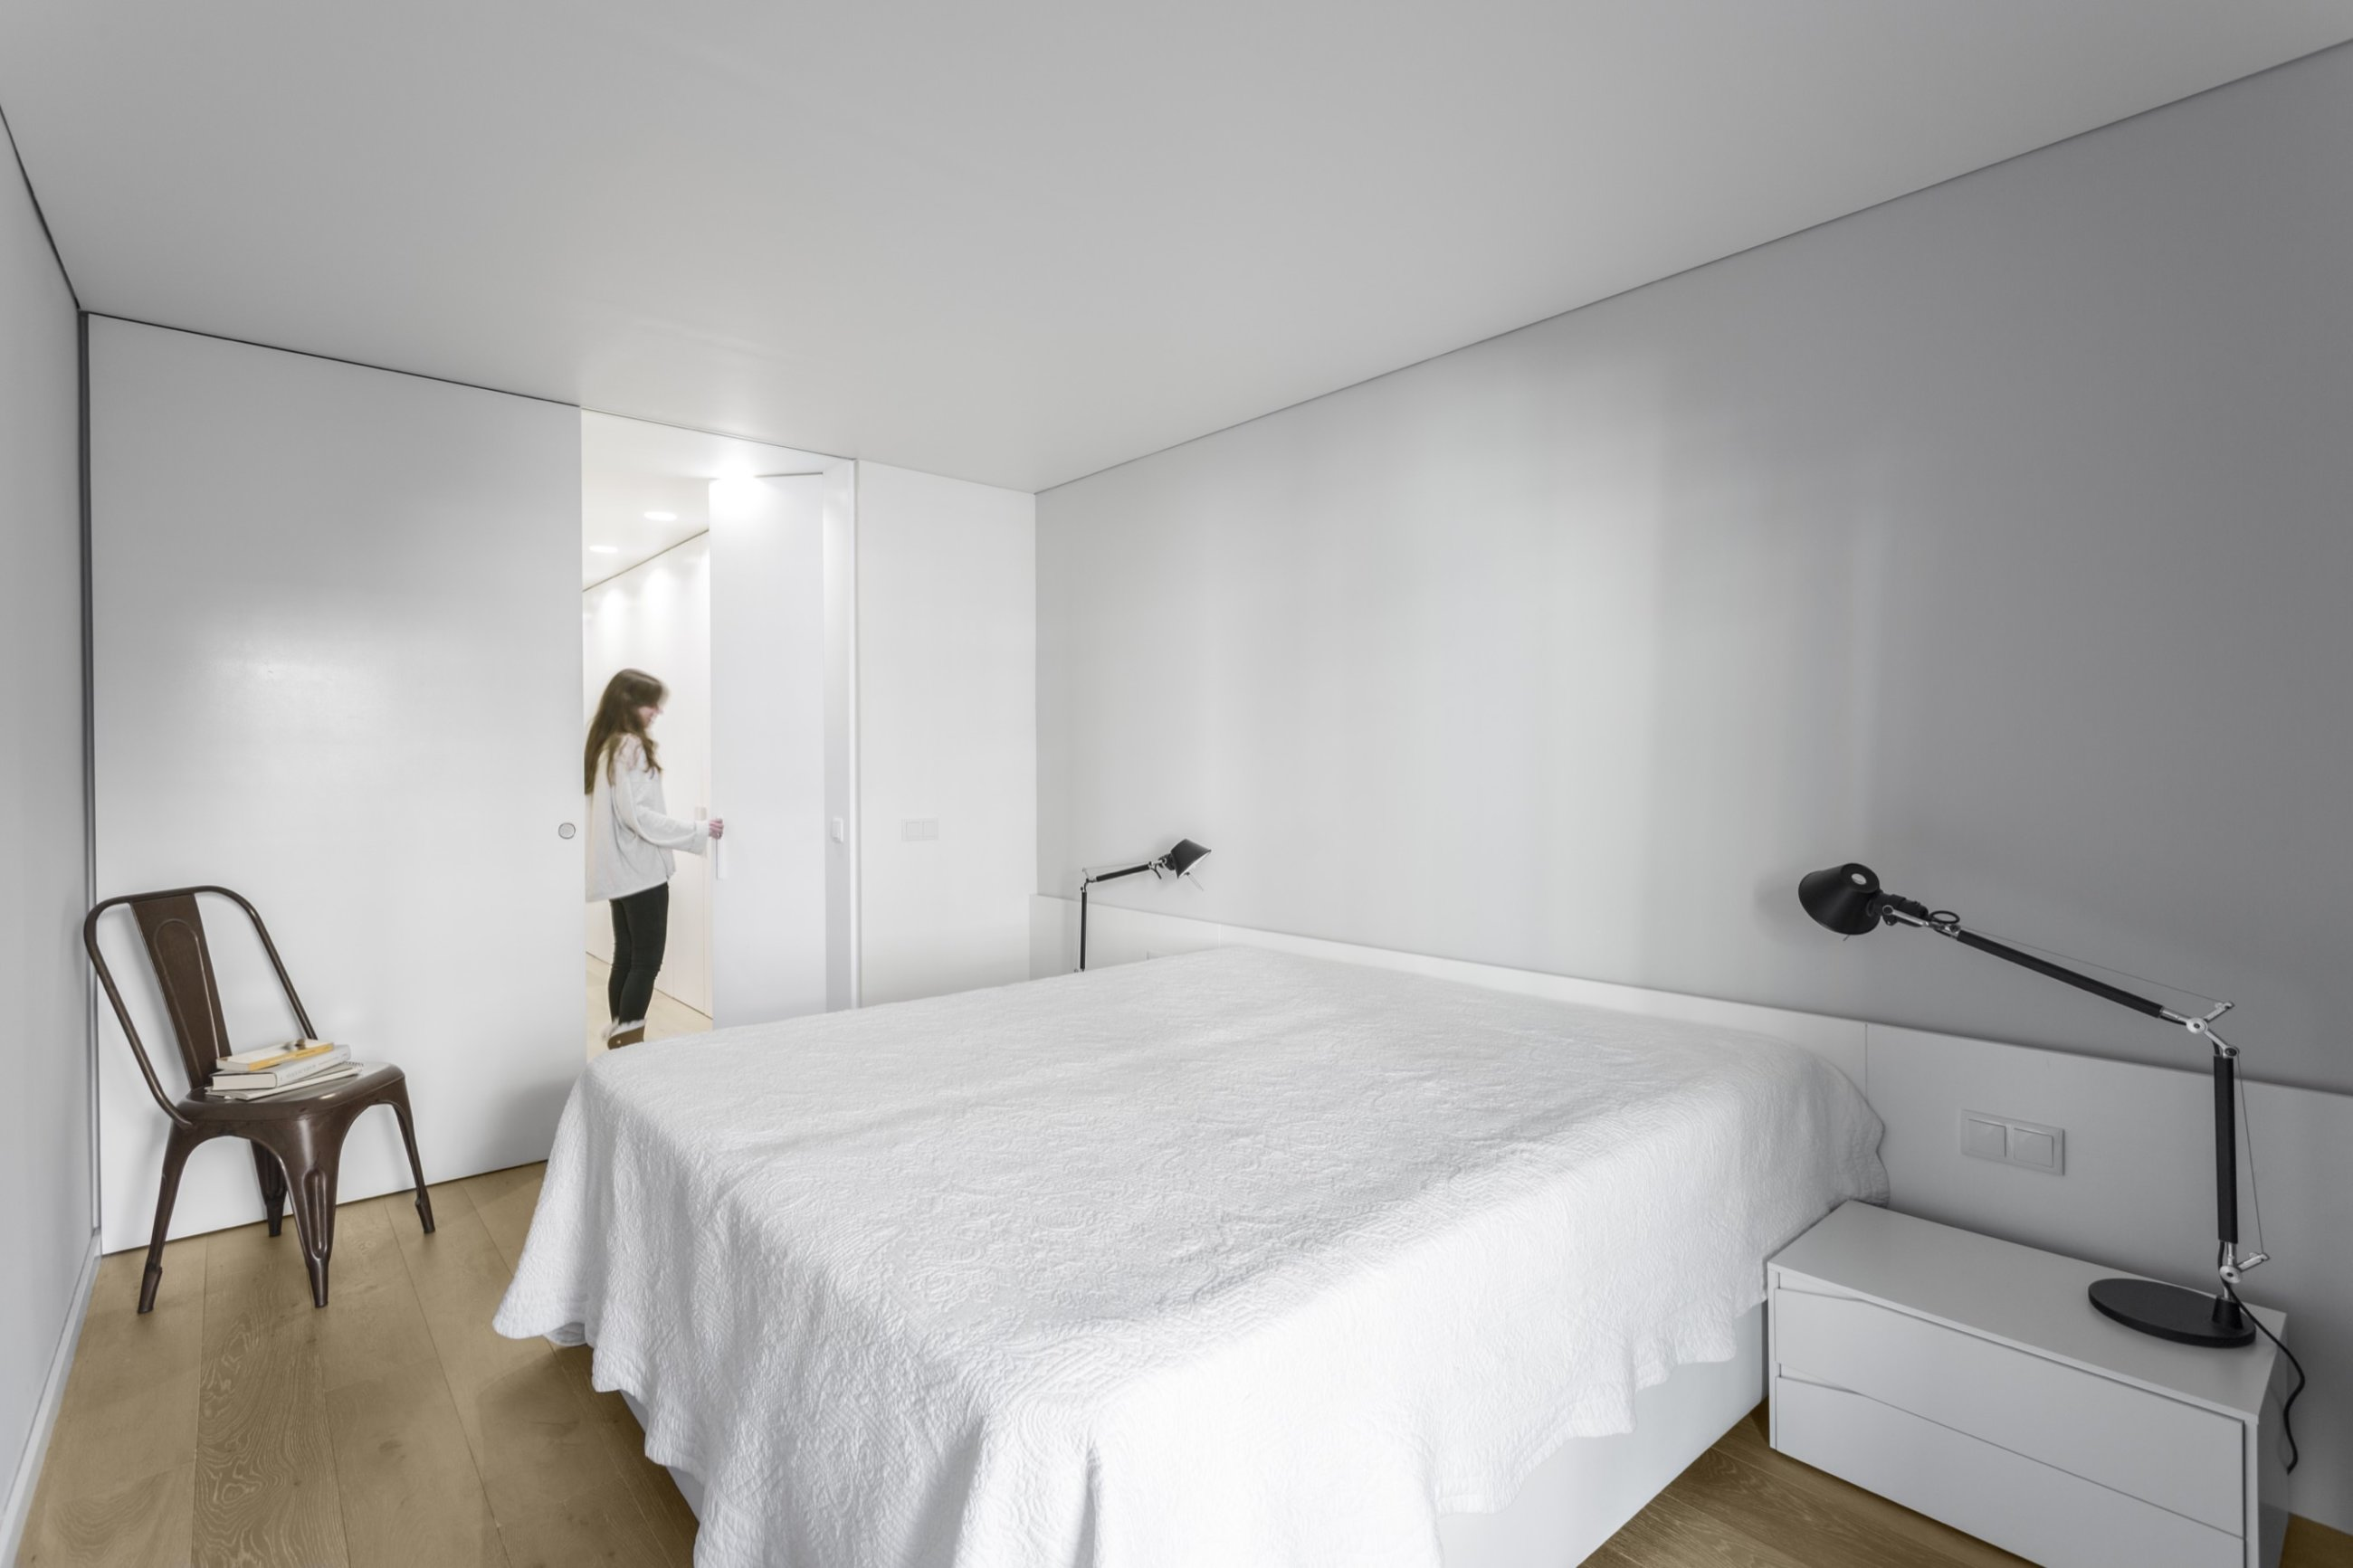 Apartamento Barcelona Arquitecto Paulo Martins 16 do fotografo Ivo Tavares Studio